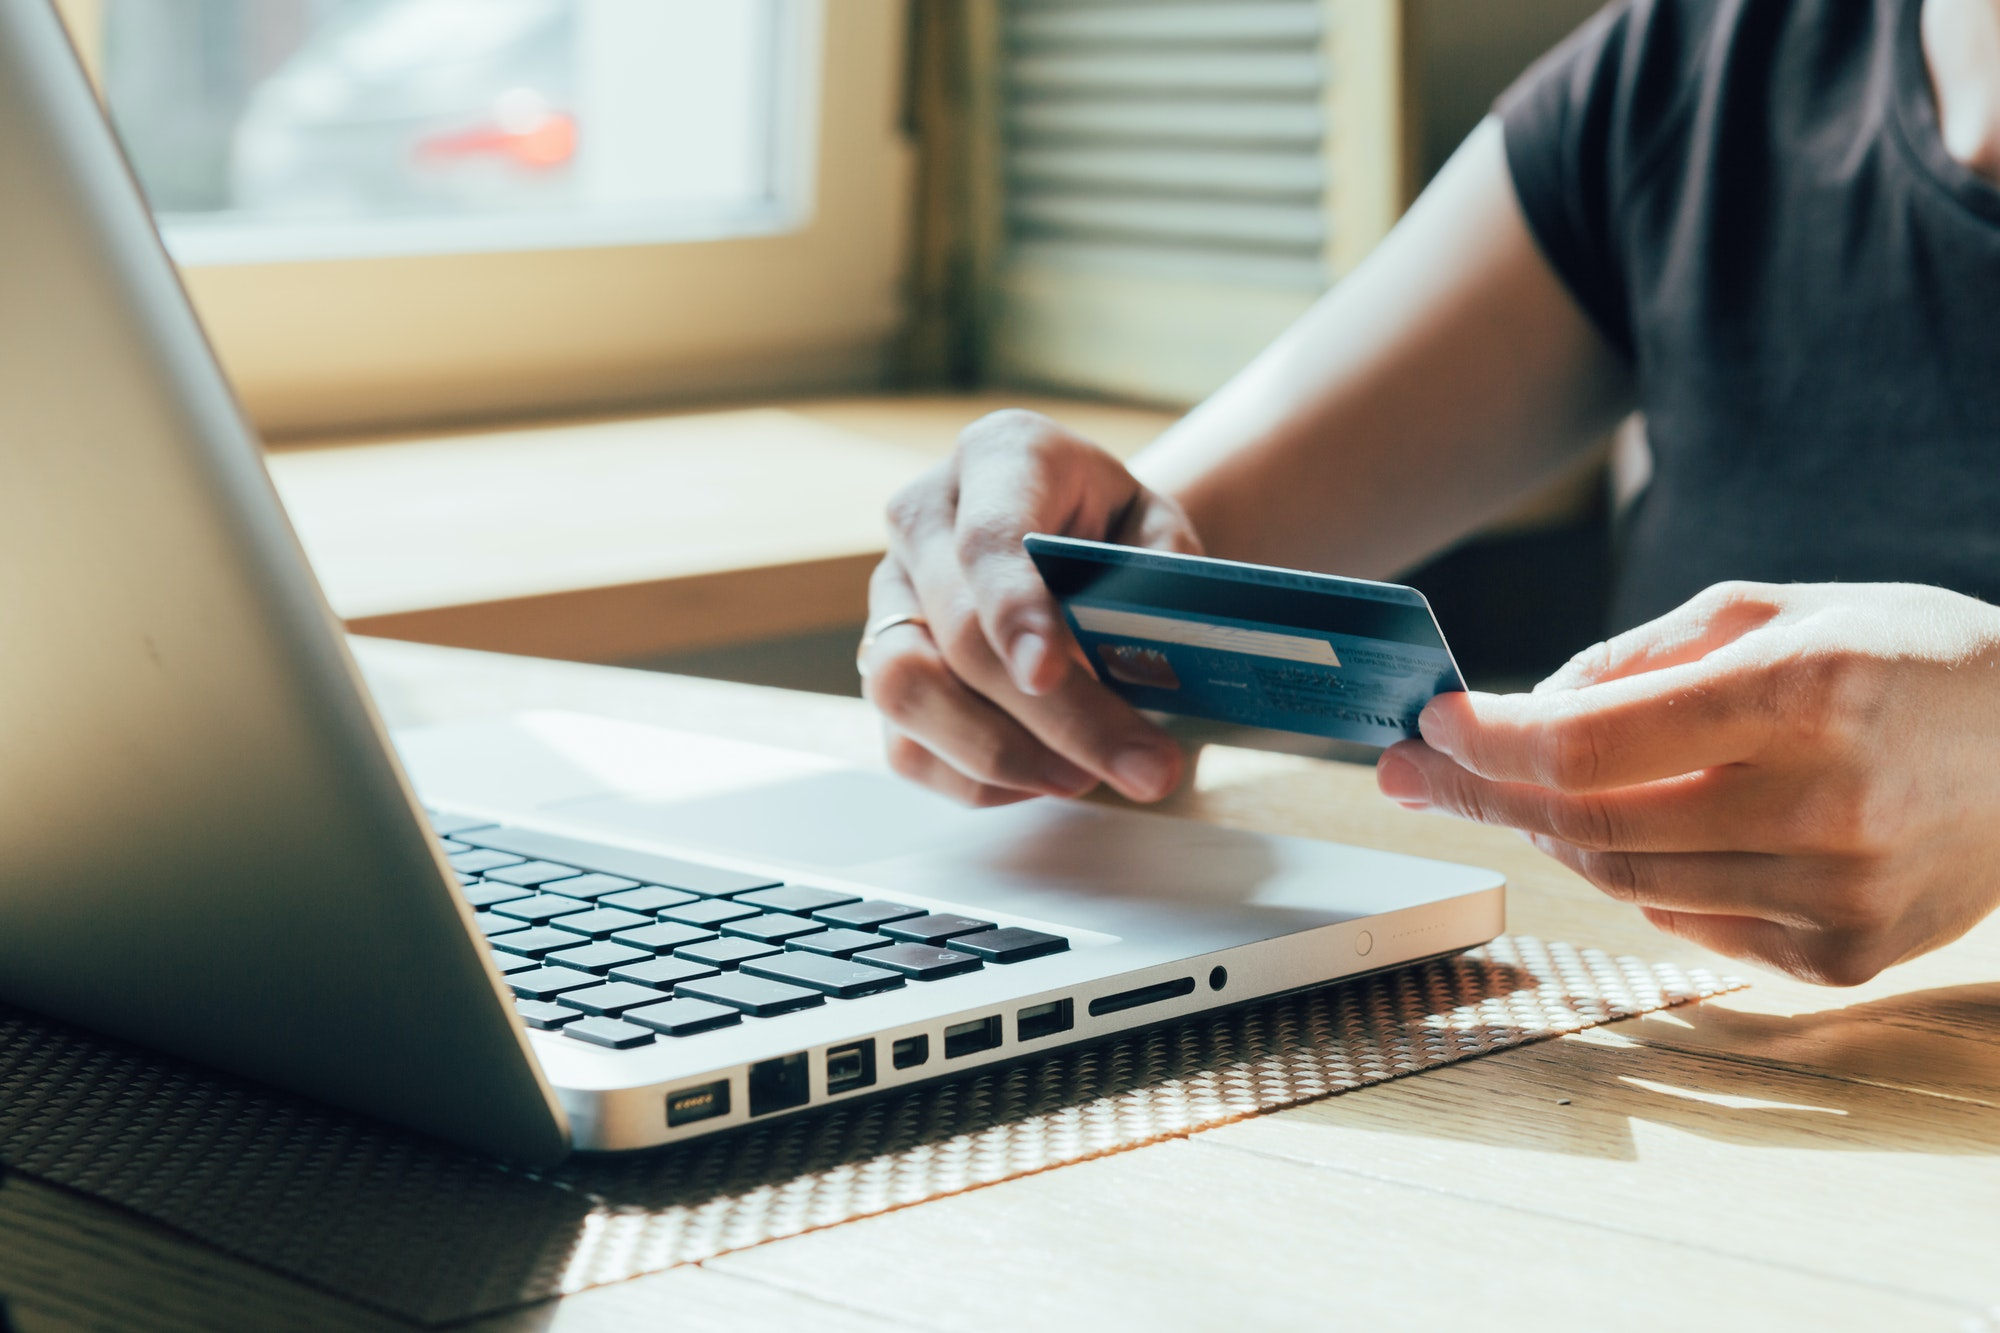 Comércio Eletrônico: Como usar táticas de SEO para impulsionar as vendas